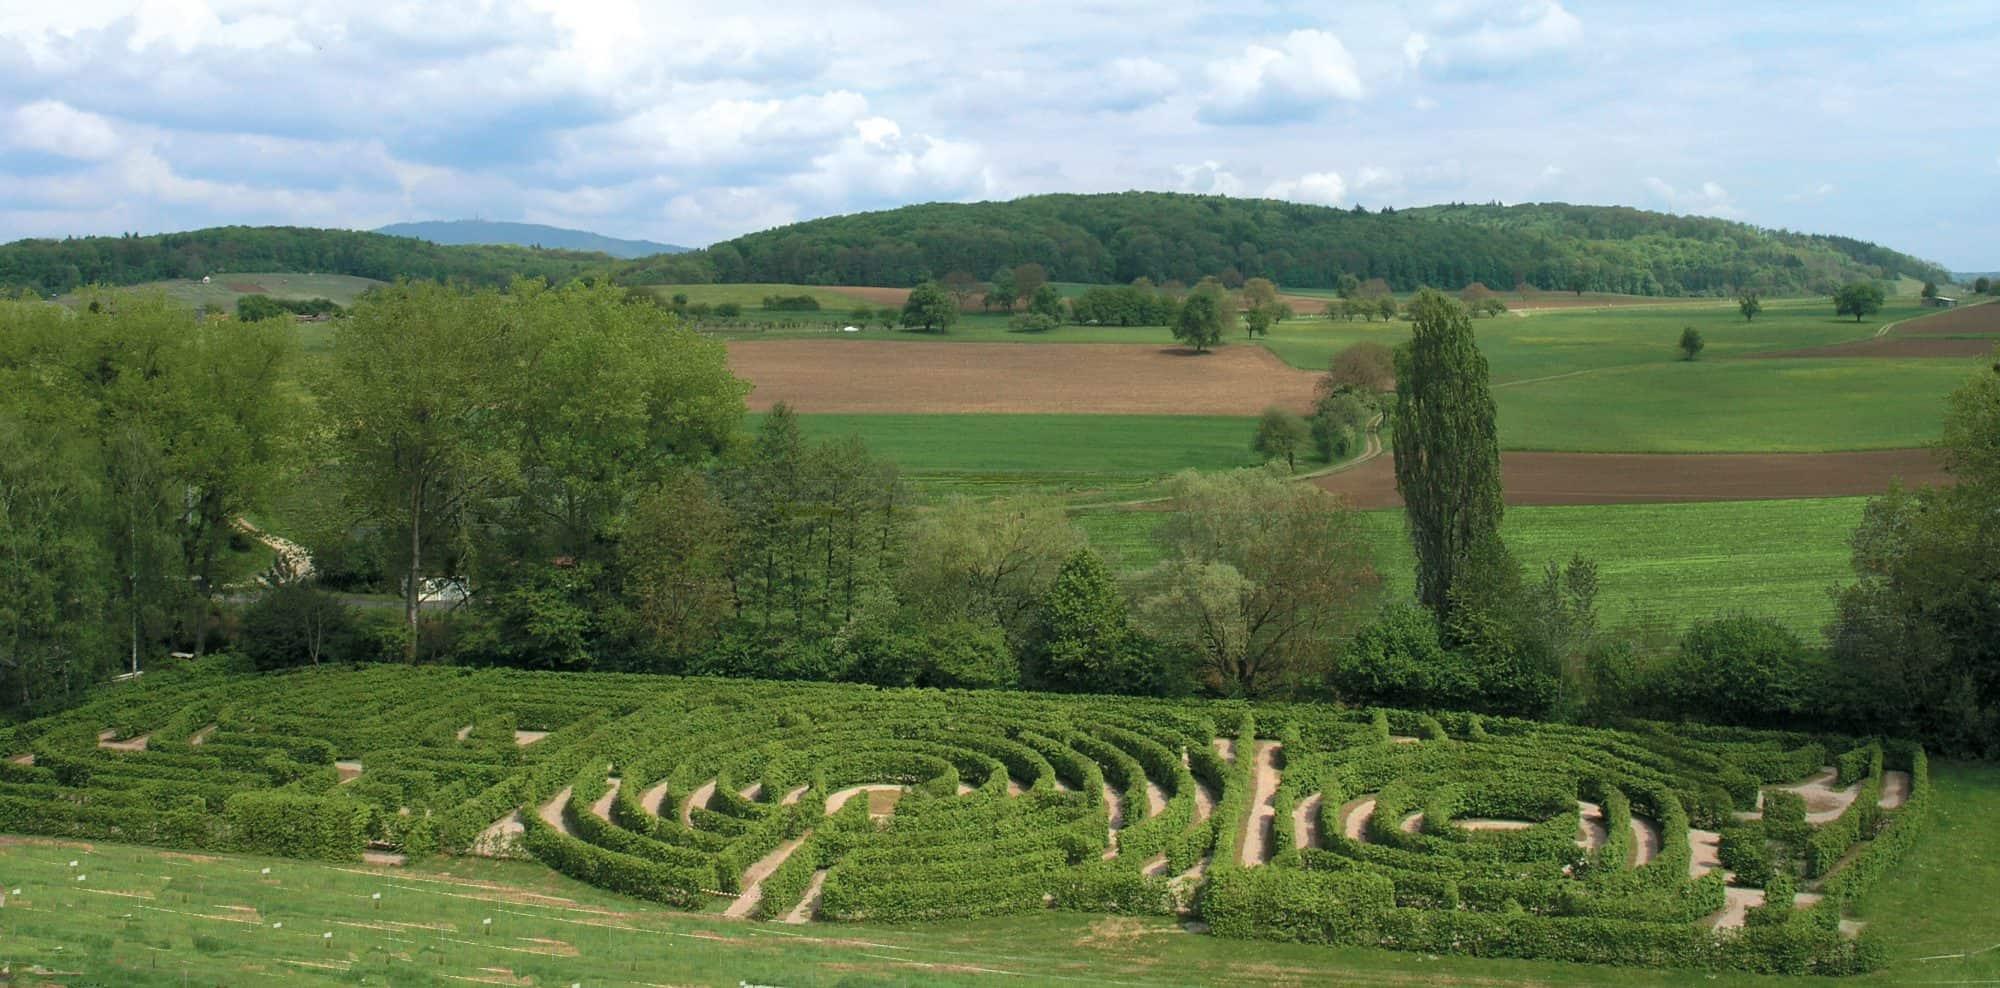 Hainbuchenlabyrinth